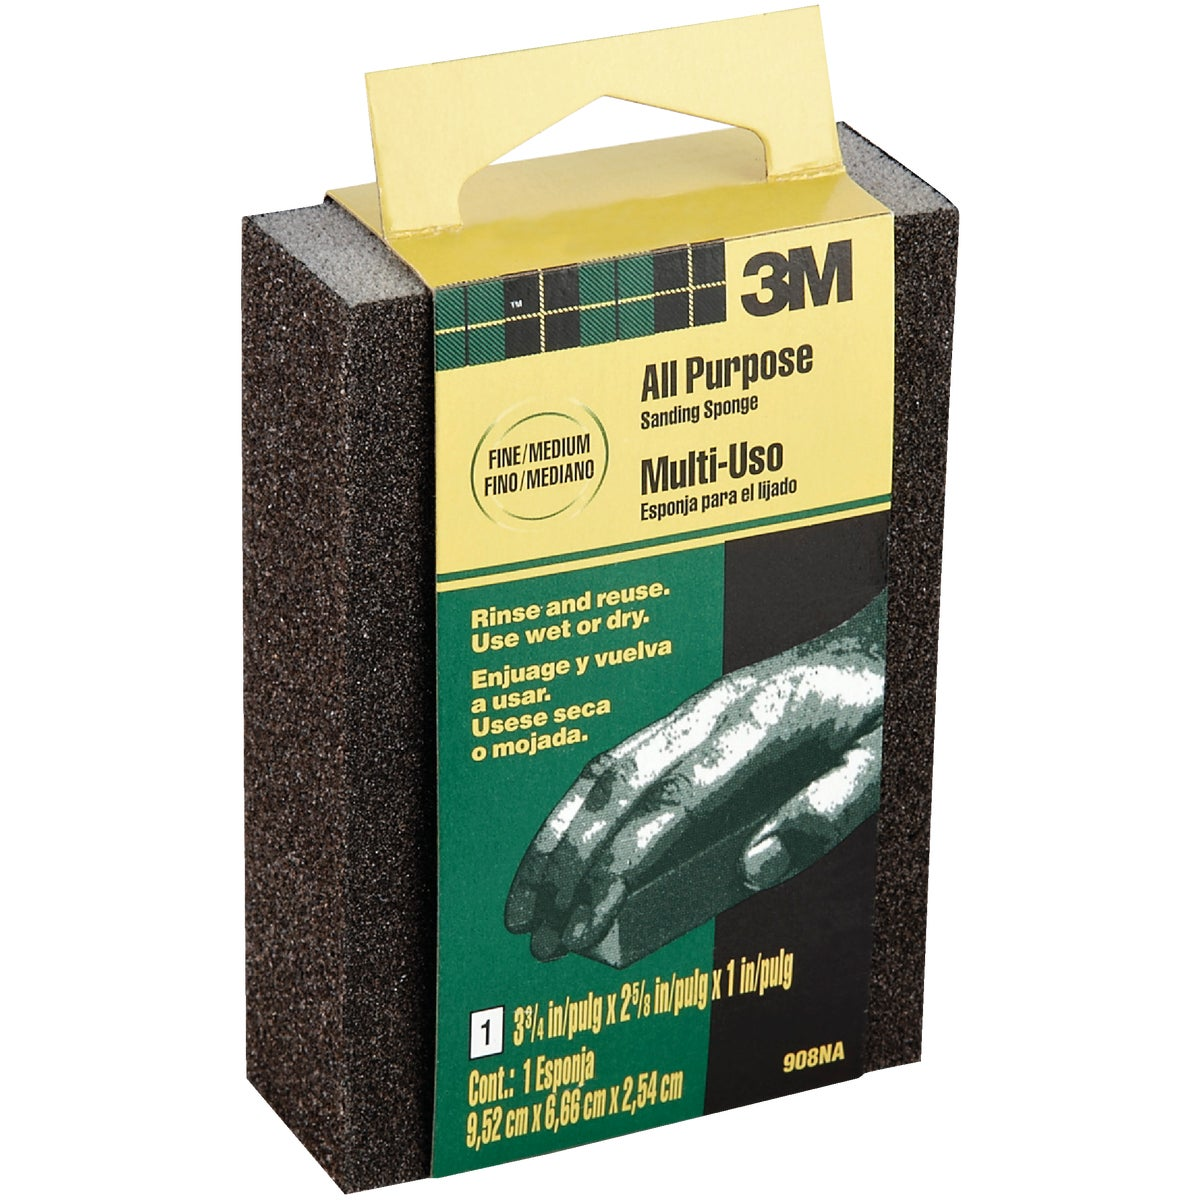 3M All-Purpose 2-5/8 In. x 3-3/4 In. x 1 In. Fine/Medium Sanding Sponge